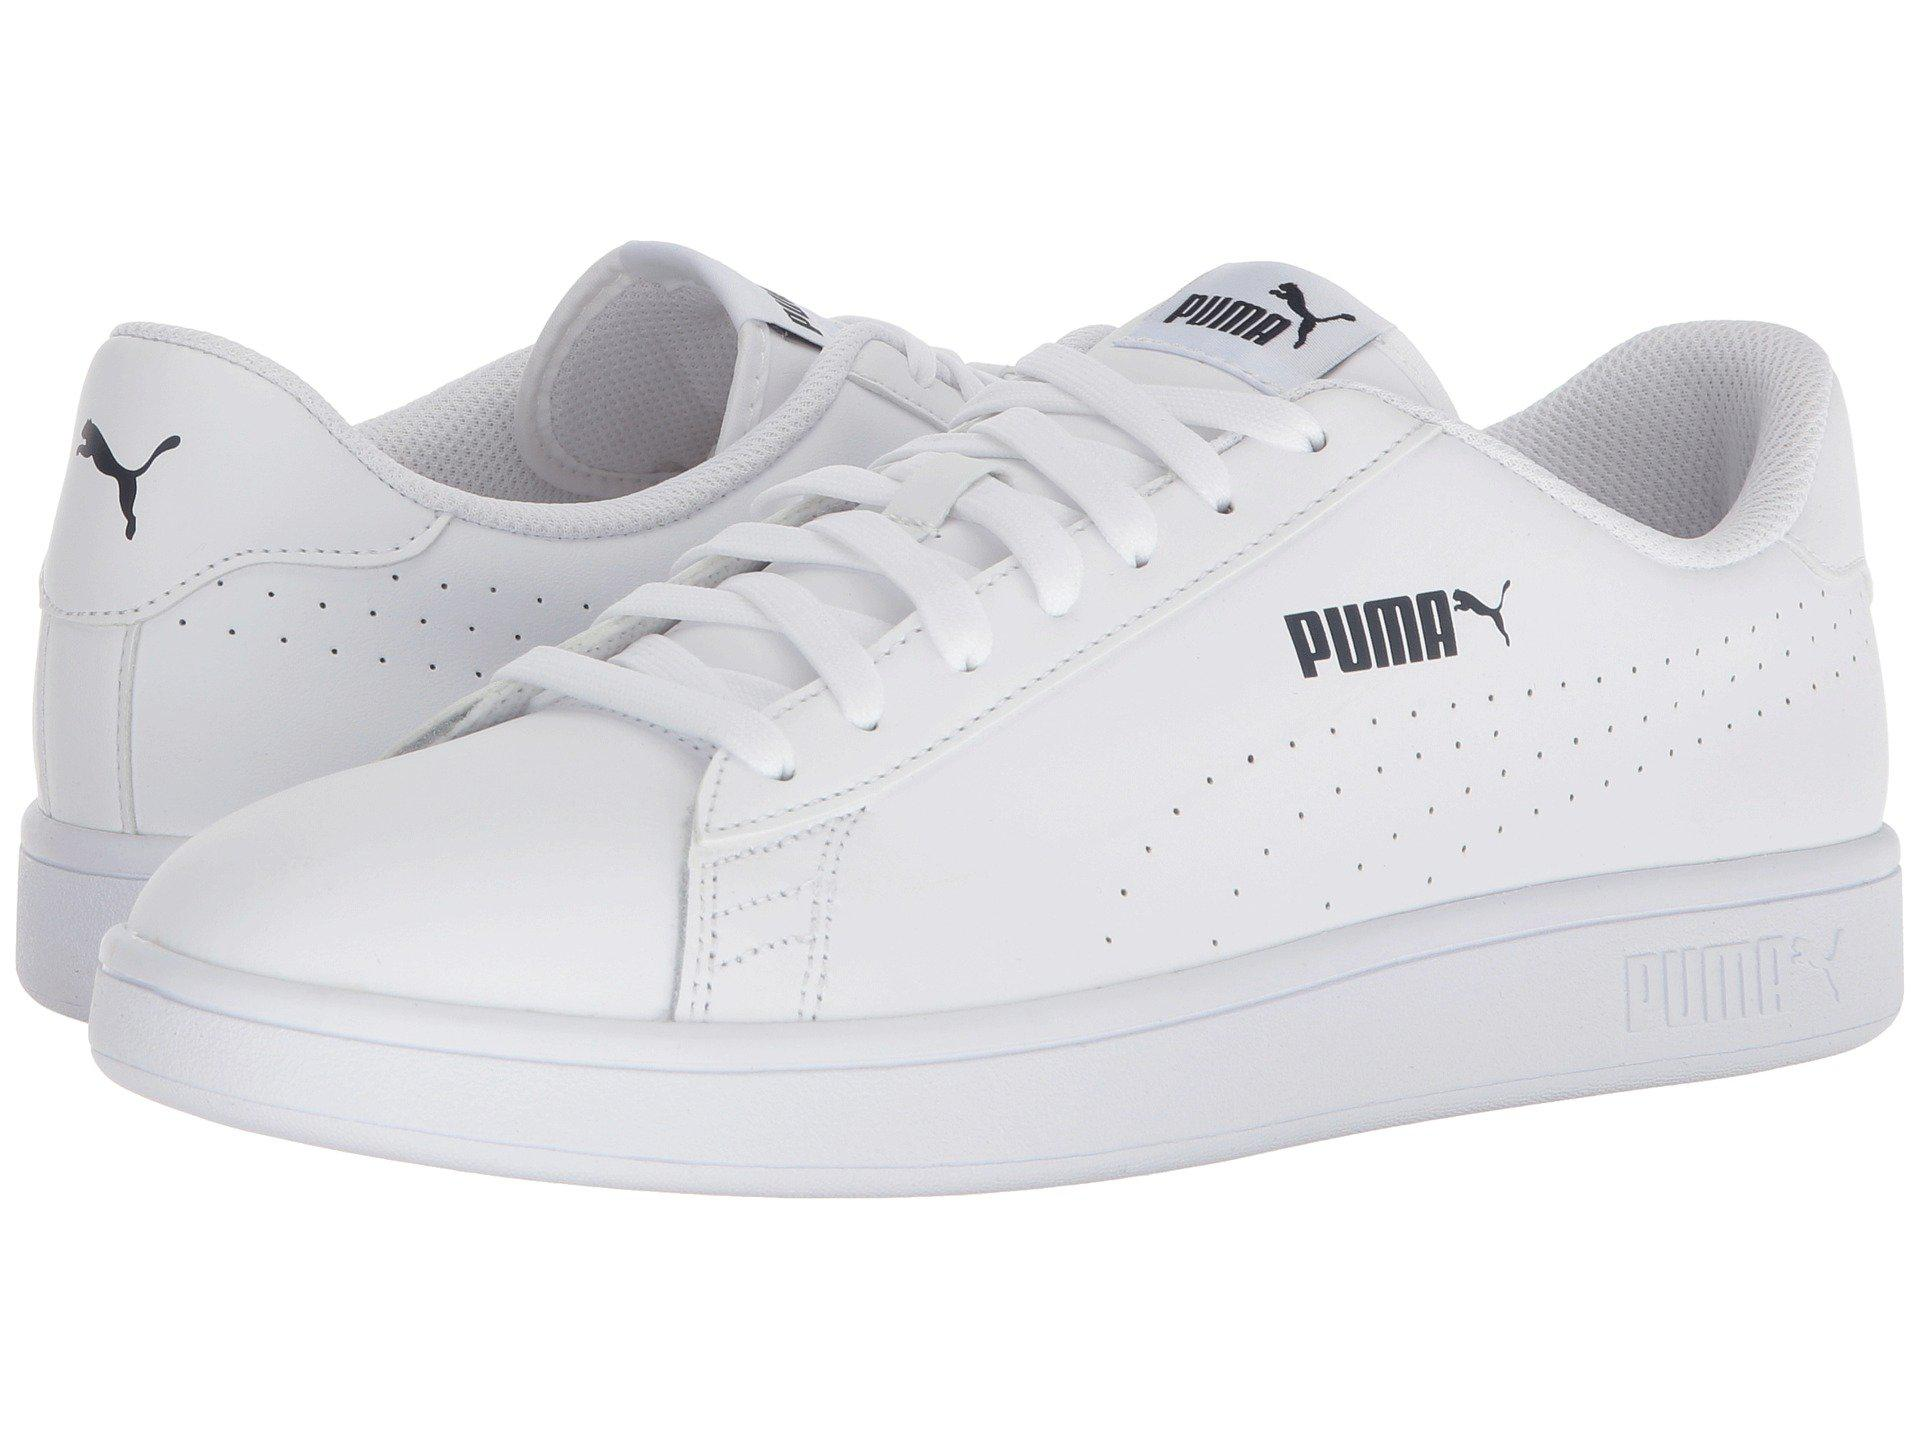 0974419c4ac Lyst - PUMA Smash V2 L Perf in White for Men